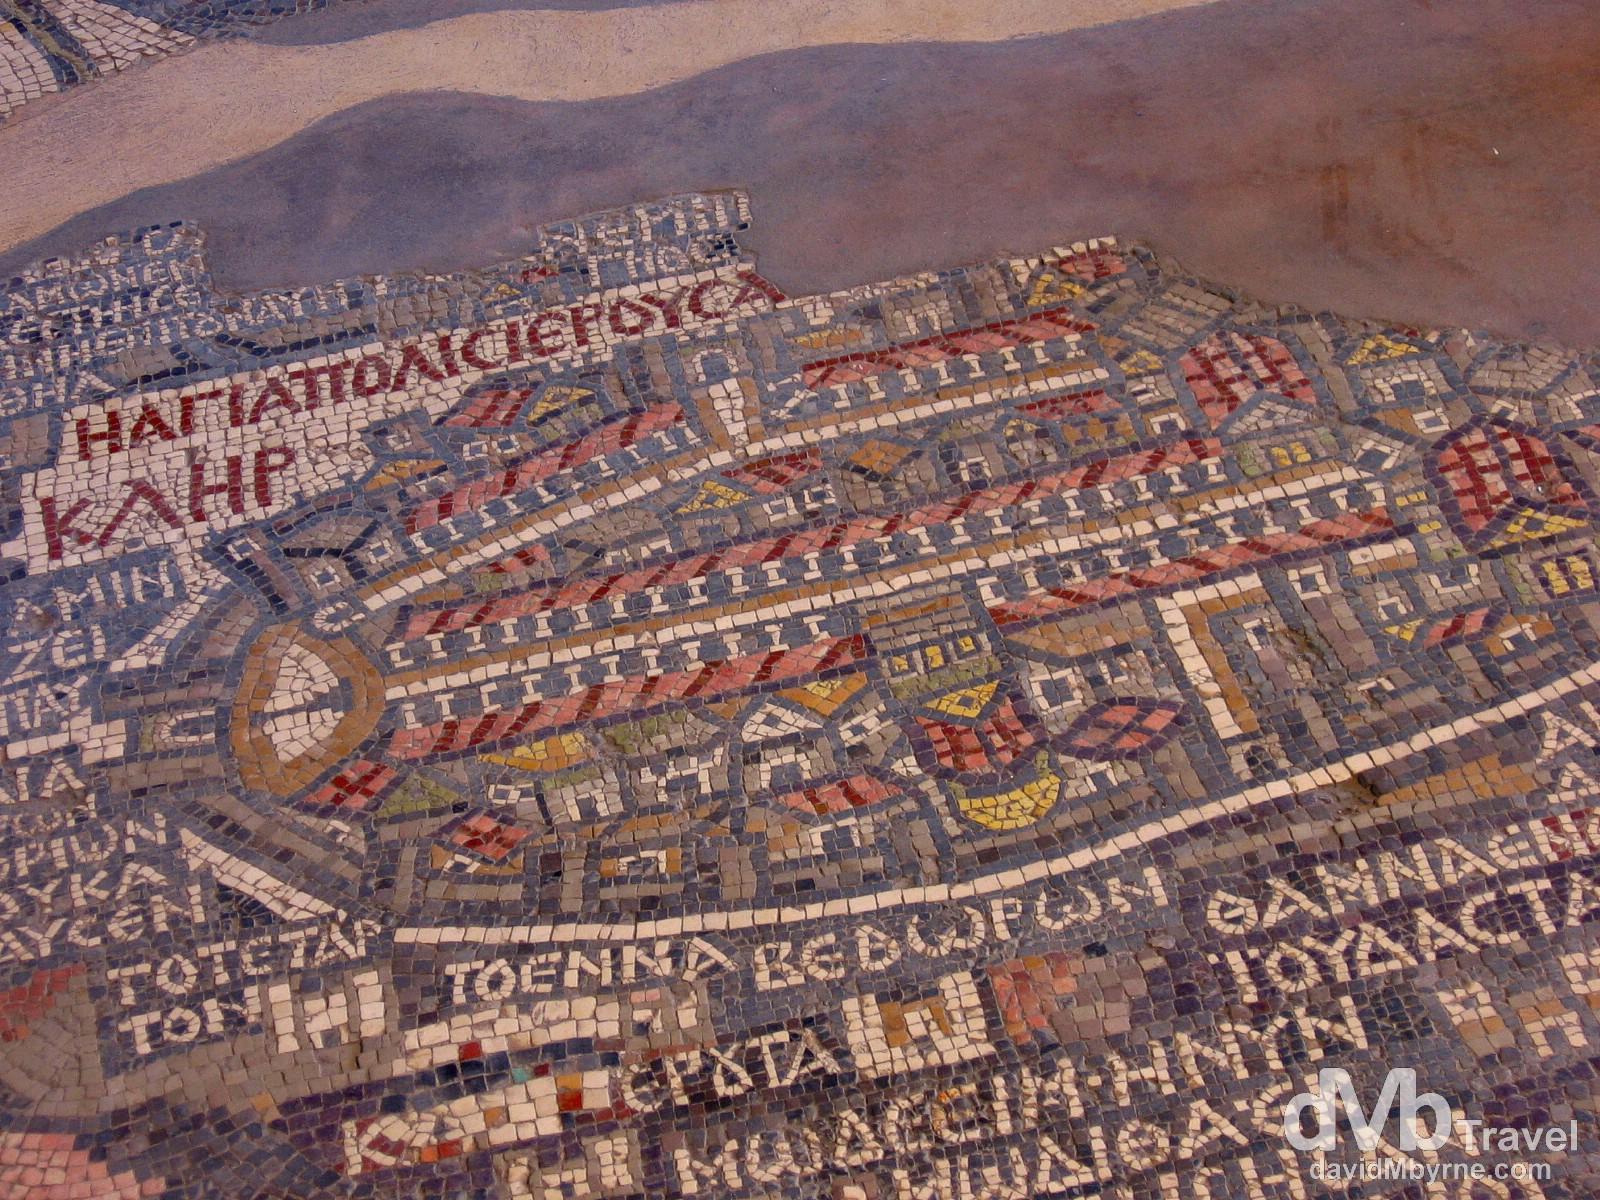 The floor mosaic in St. George Church, Madaba, Jordan. April 29, 2008.